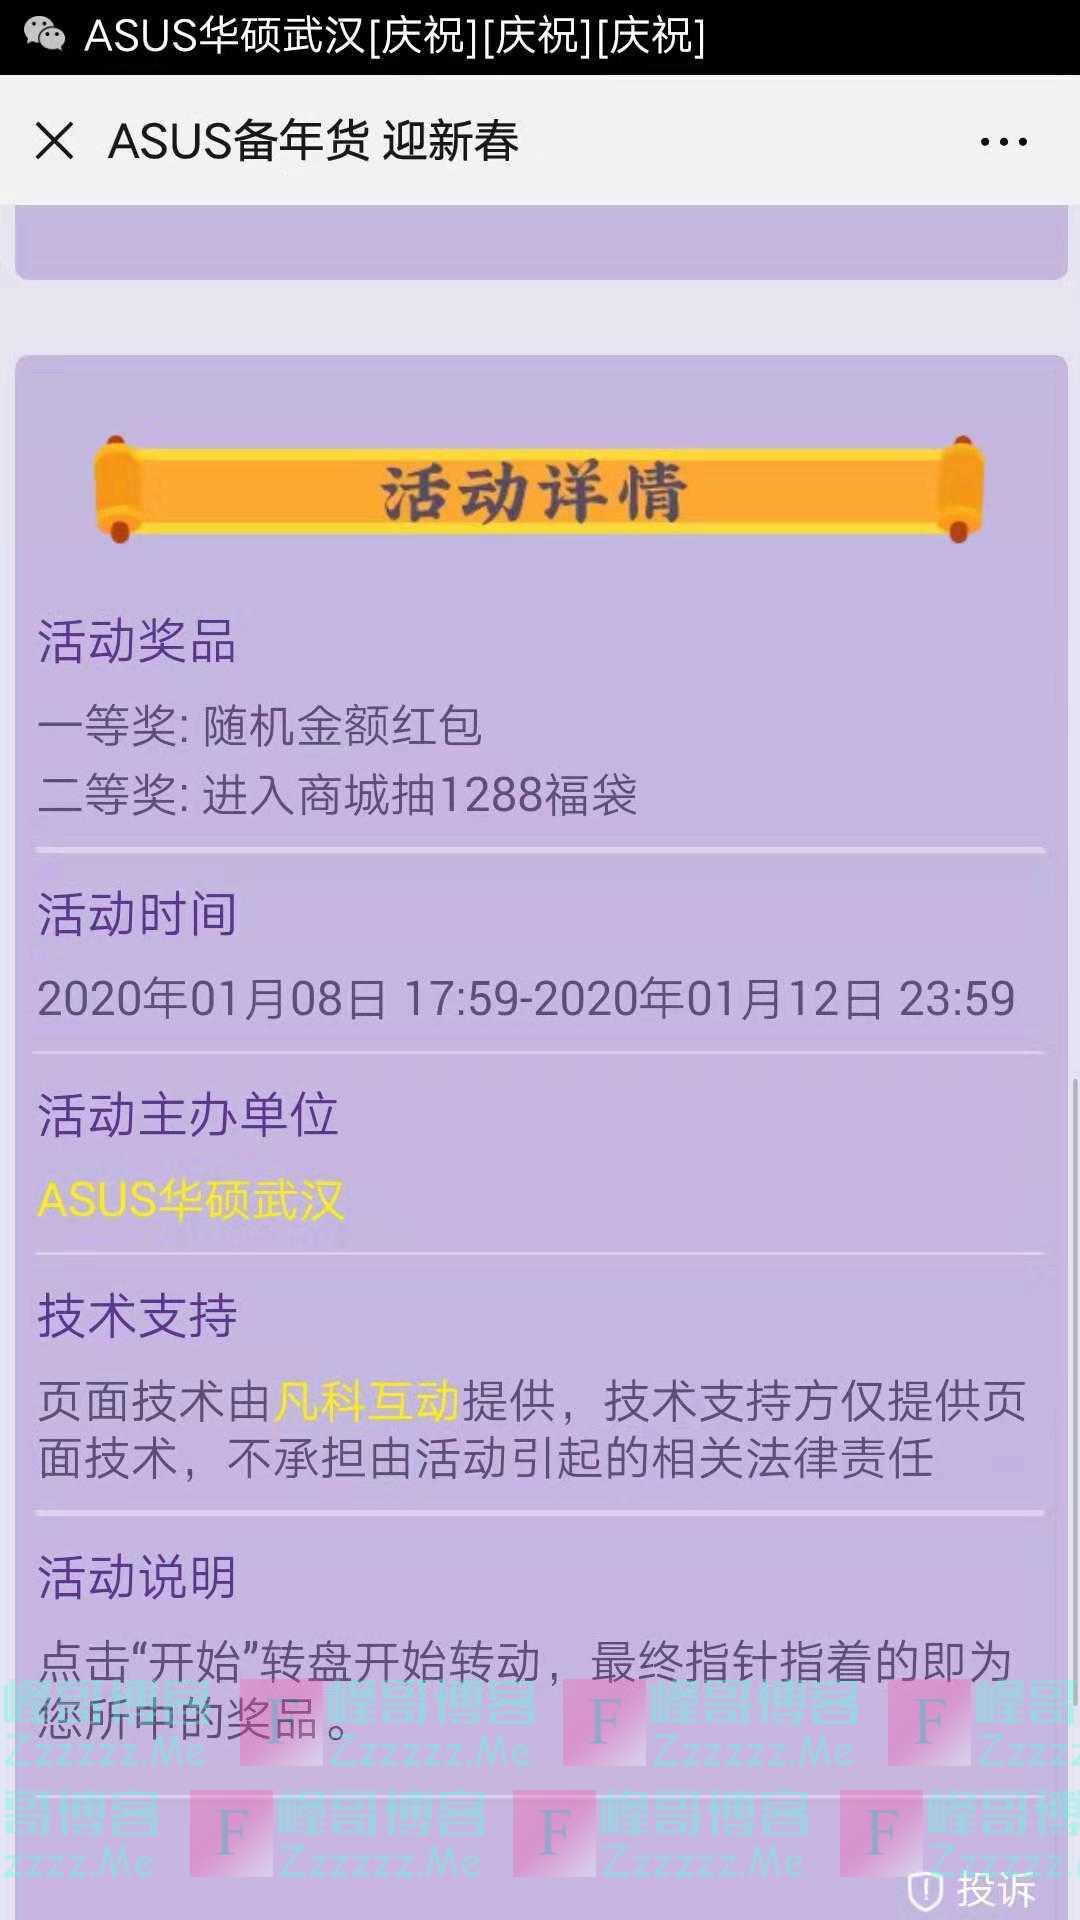 ASUS华硕武汉 粉丝福利(截止1月12日)